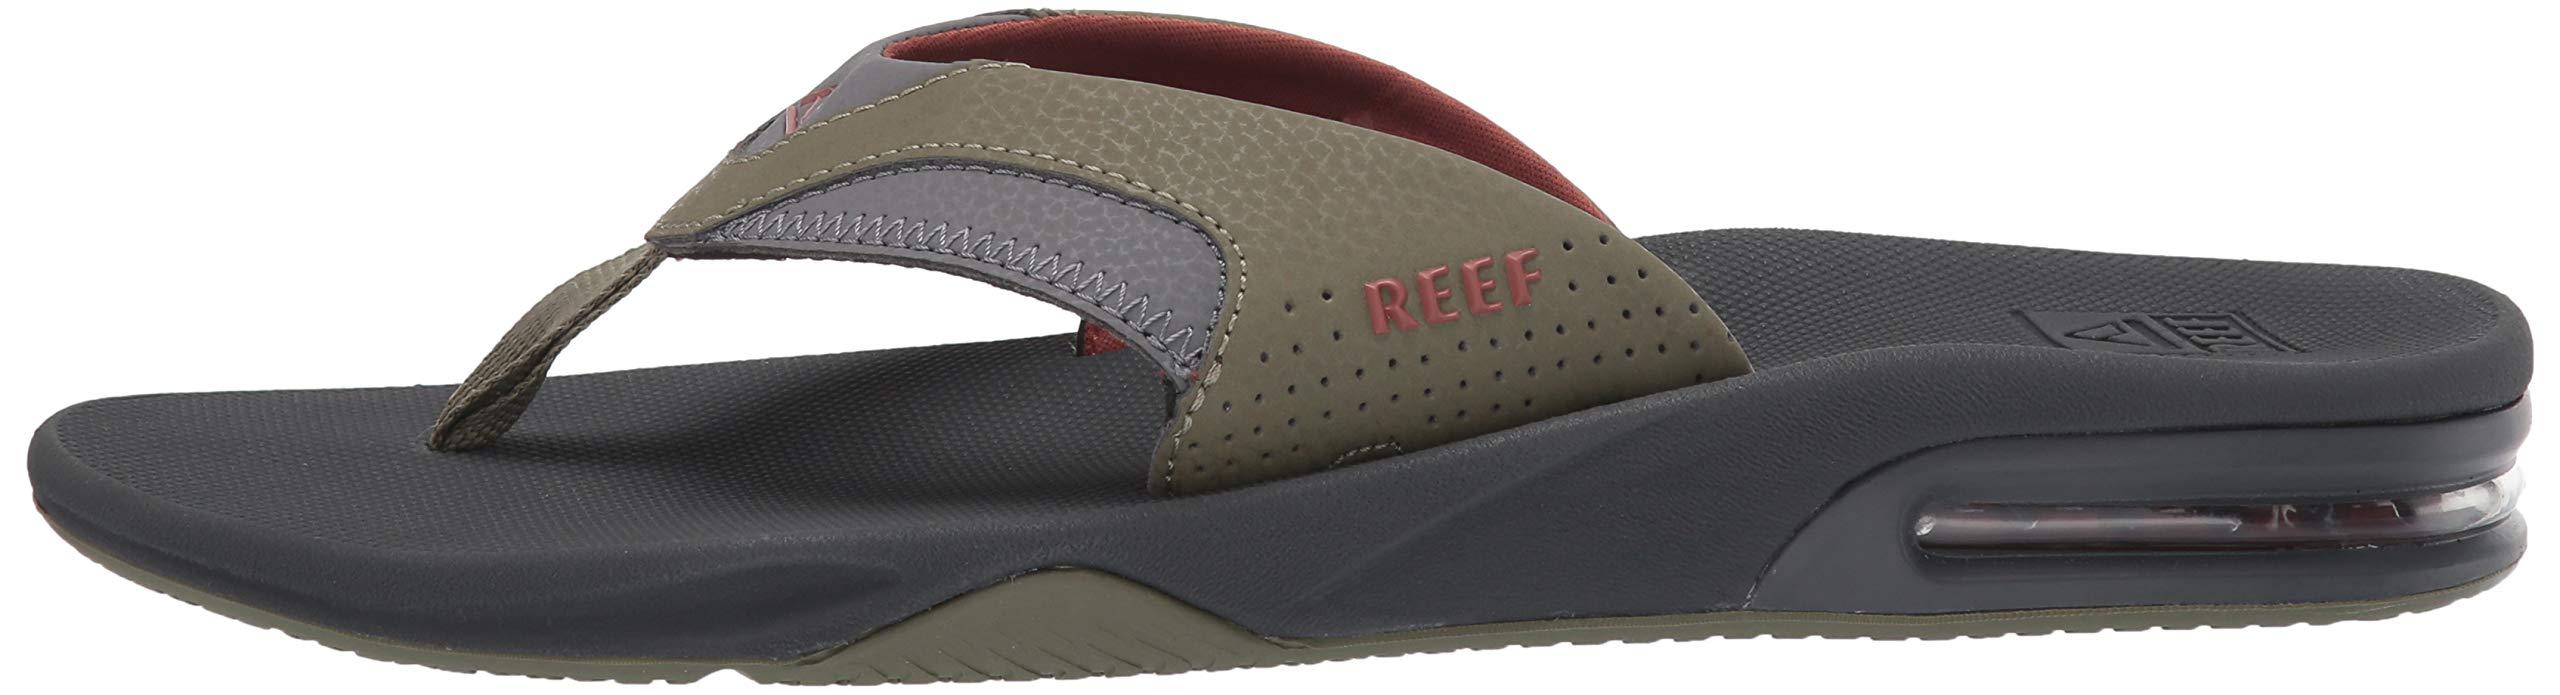 Reef Men's Fanning Sandal Olive/Rust 040 M US by Reef (Image #5)